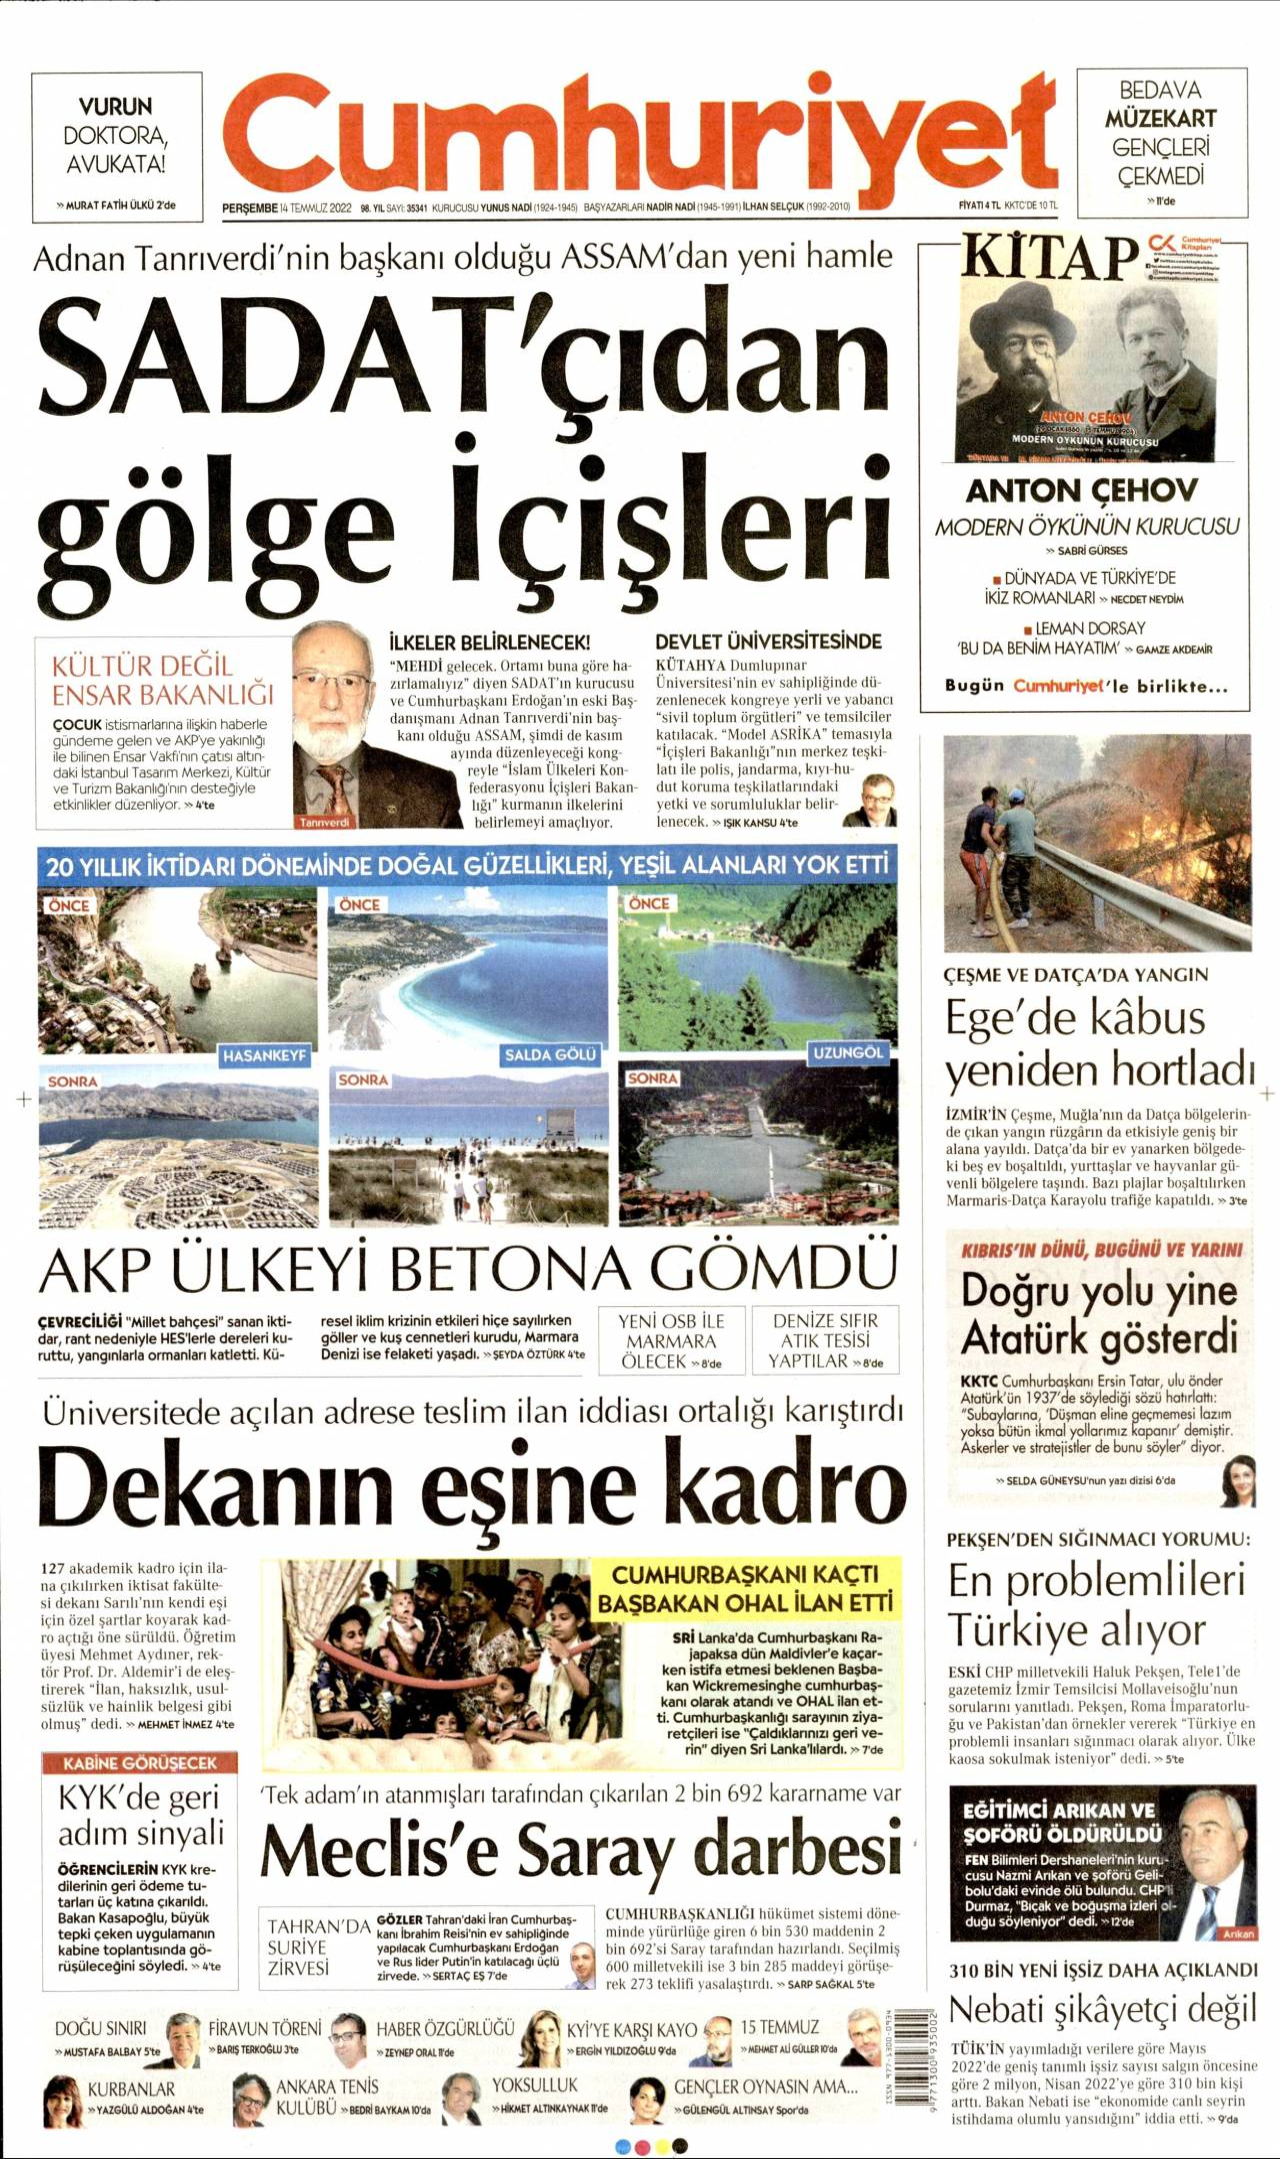 27 Mayıs 2019 Pazartesi Cumhuriyet Gazetesi Manşeti